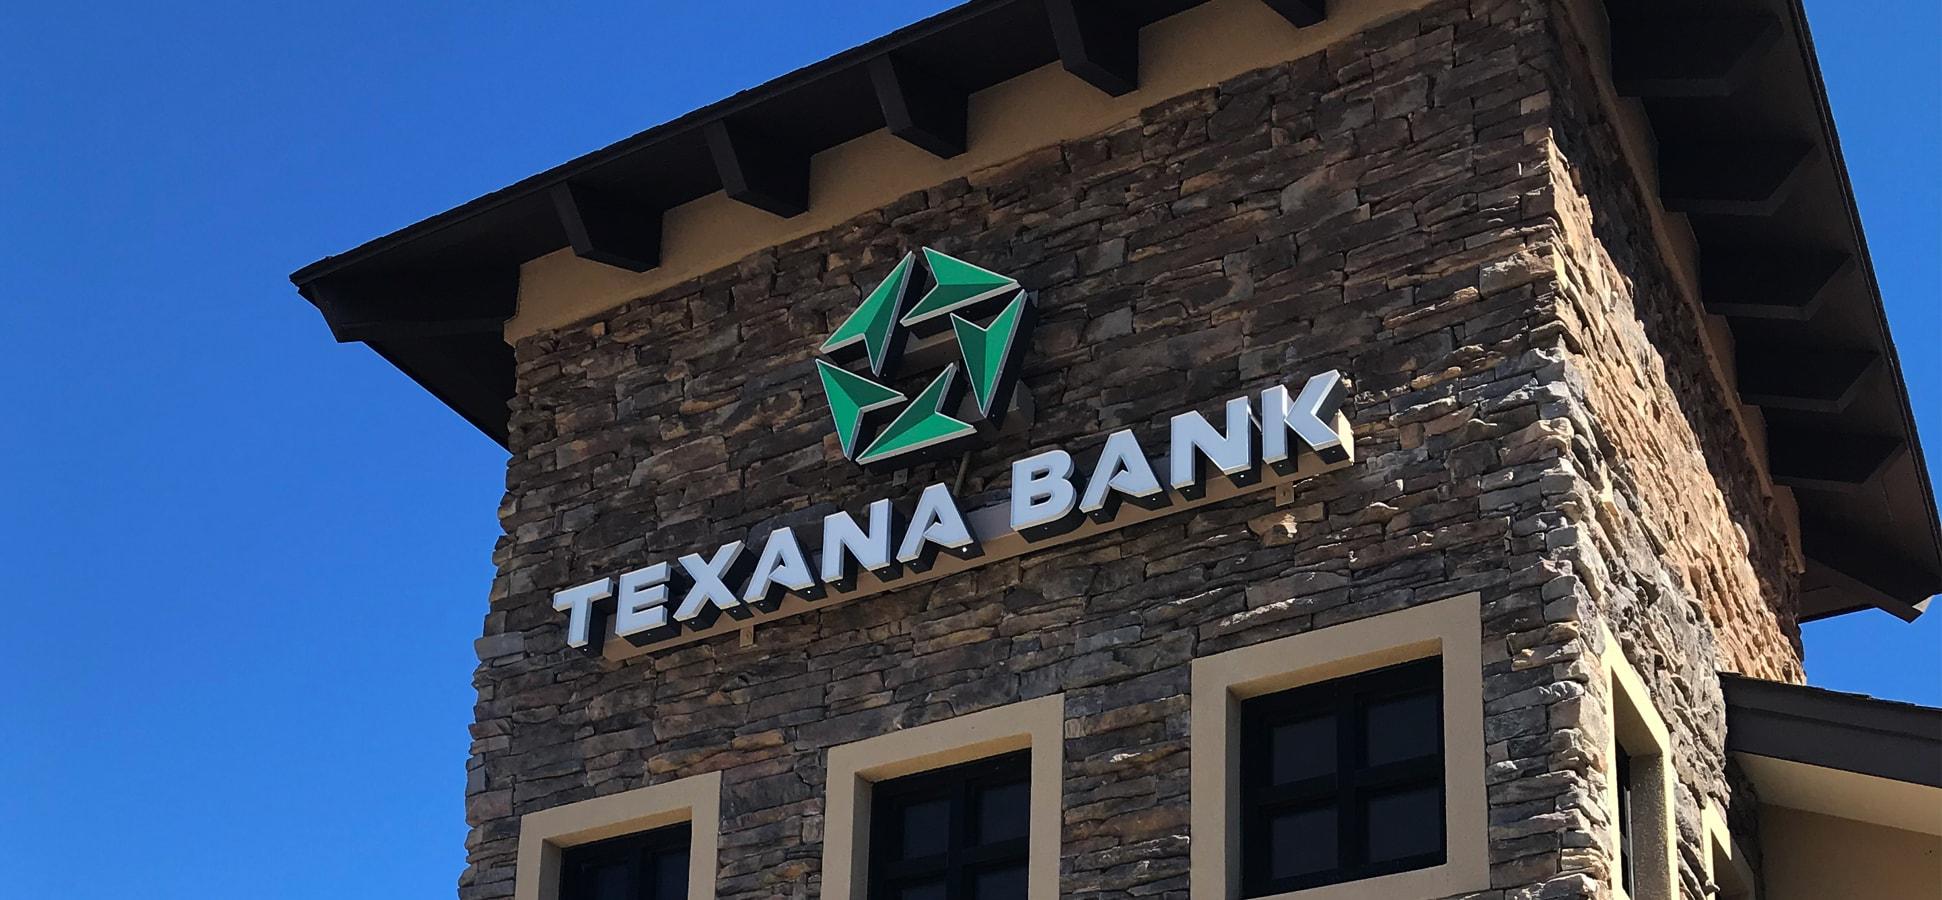 Texana Signage on Building